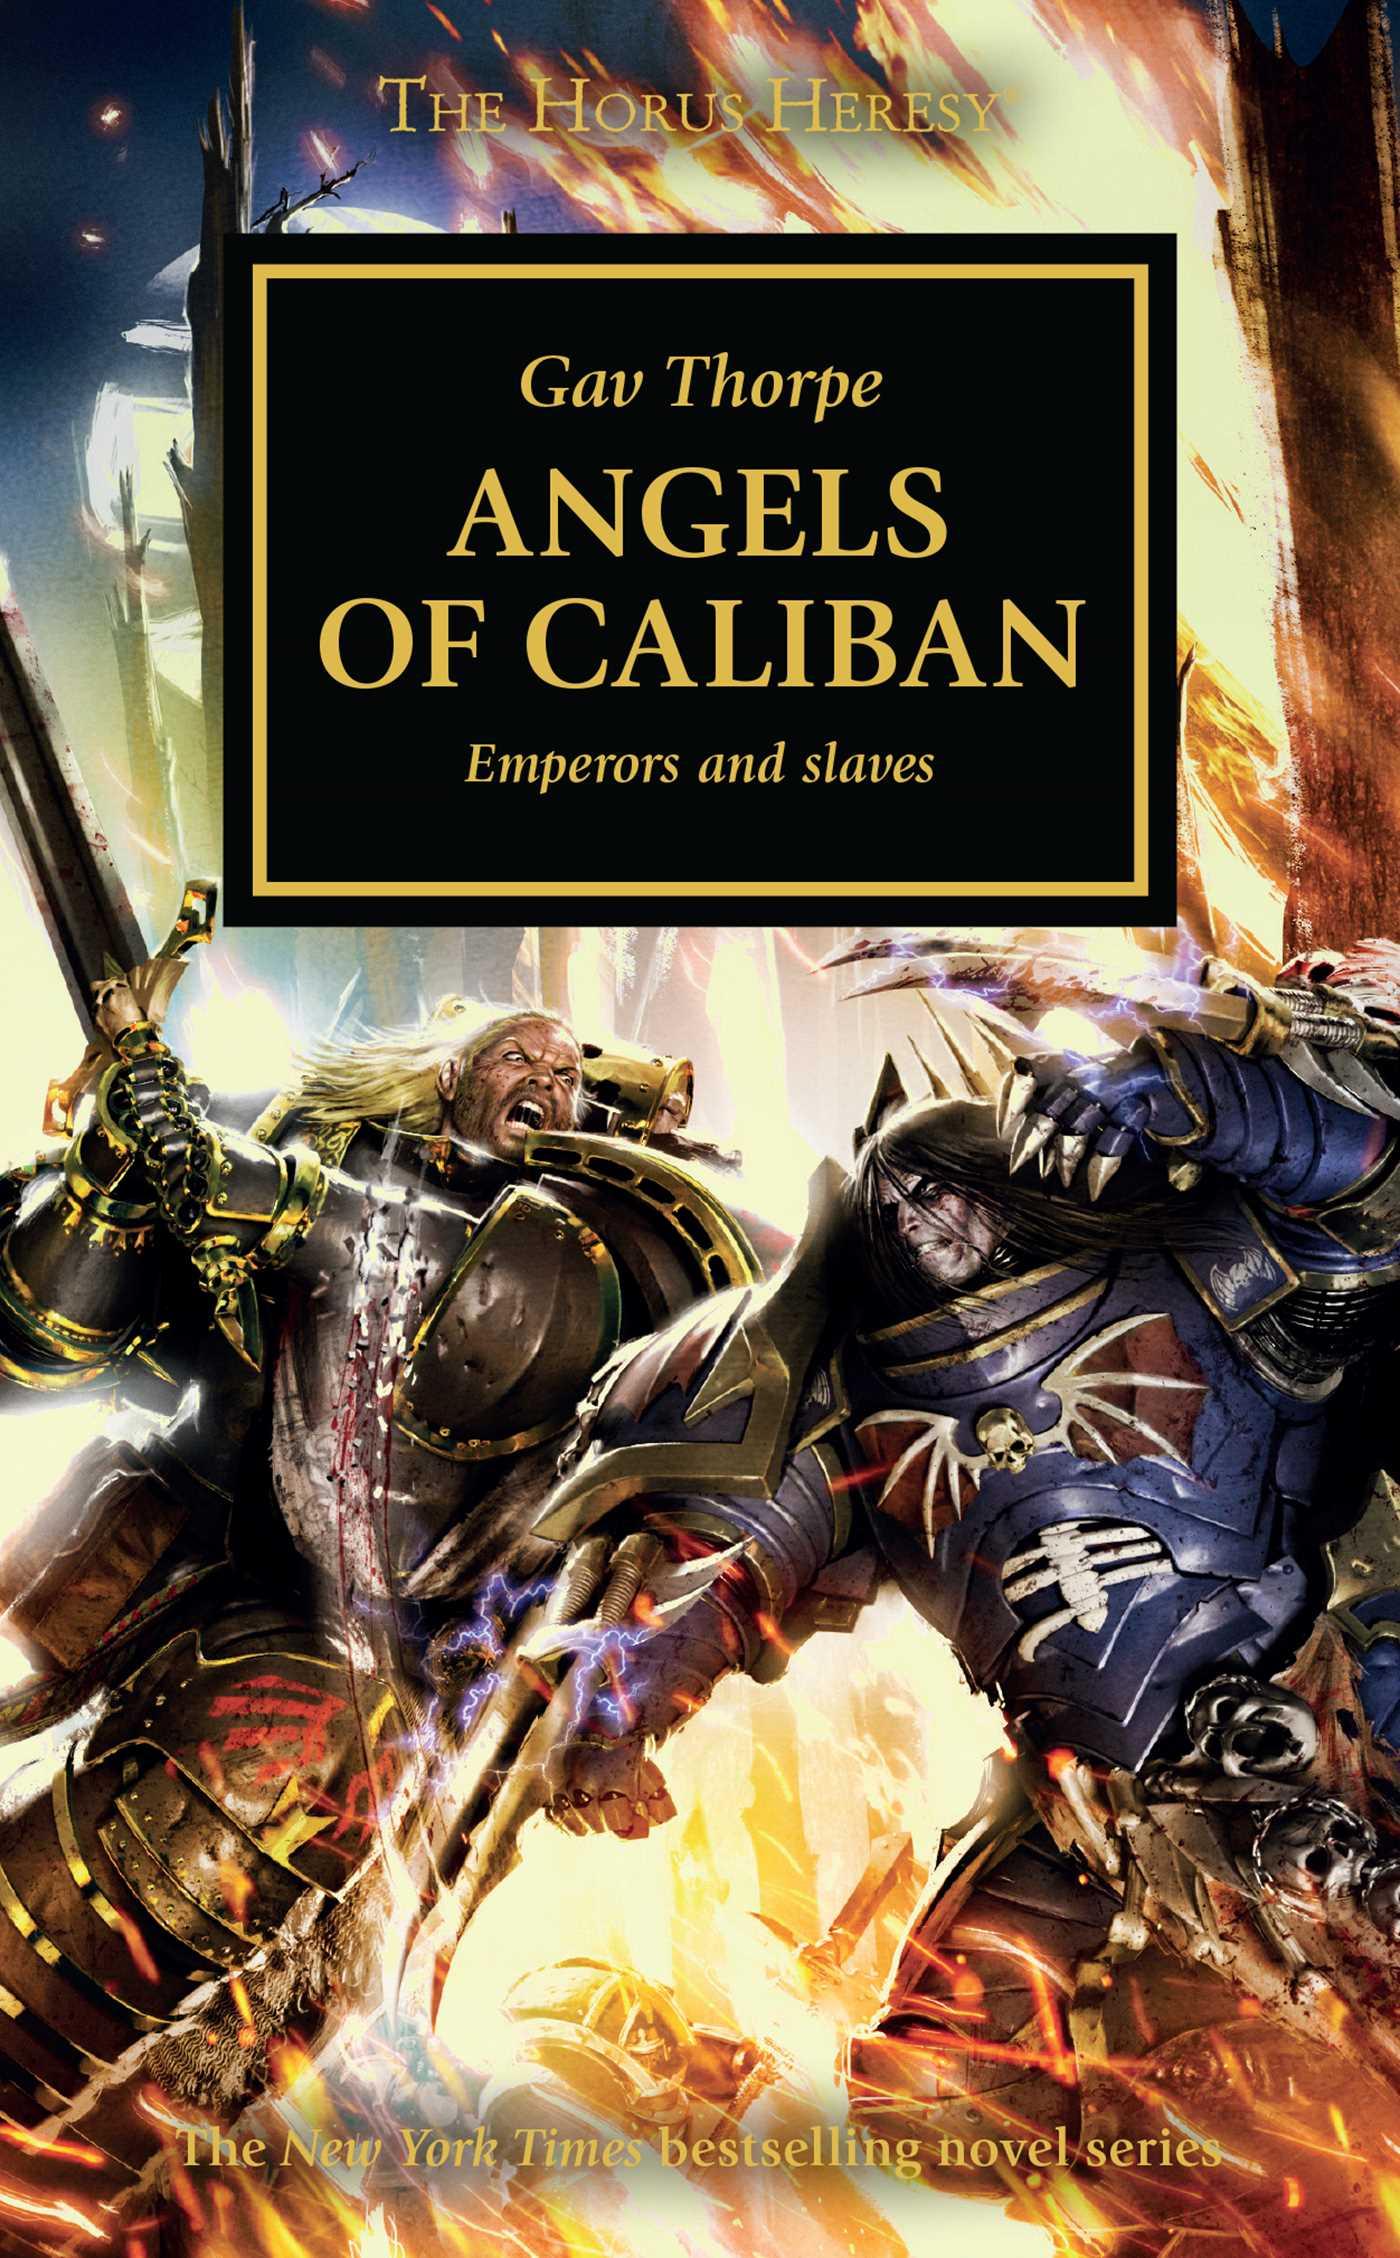 Angels of caliban 9781784965372 hr